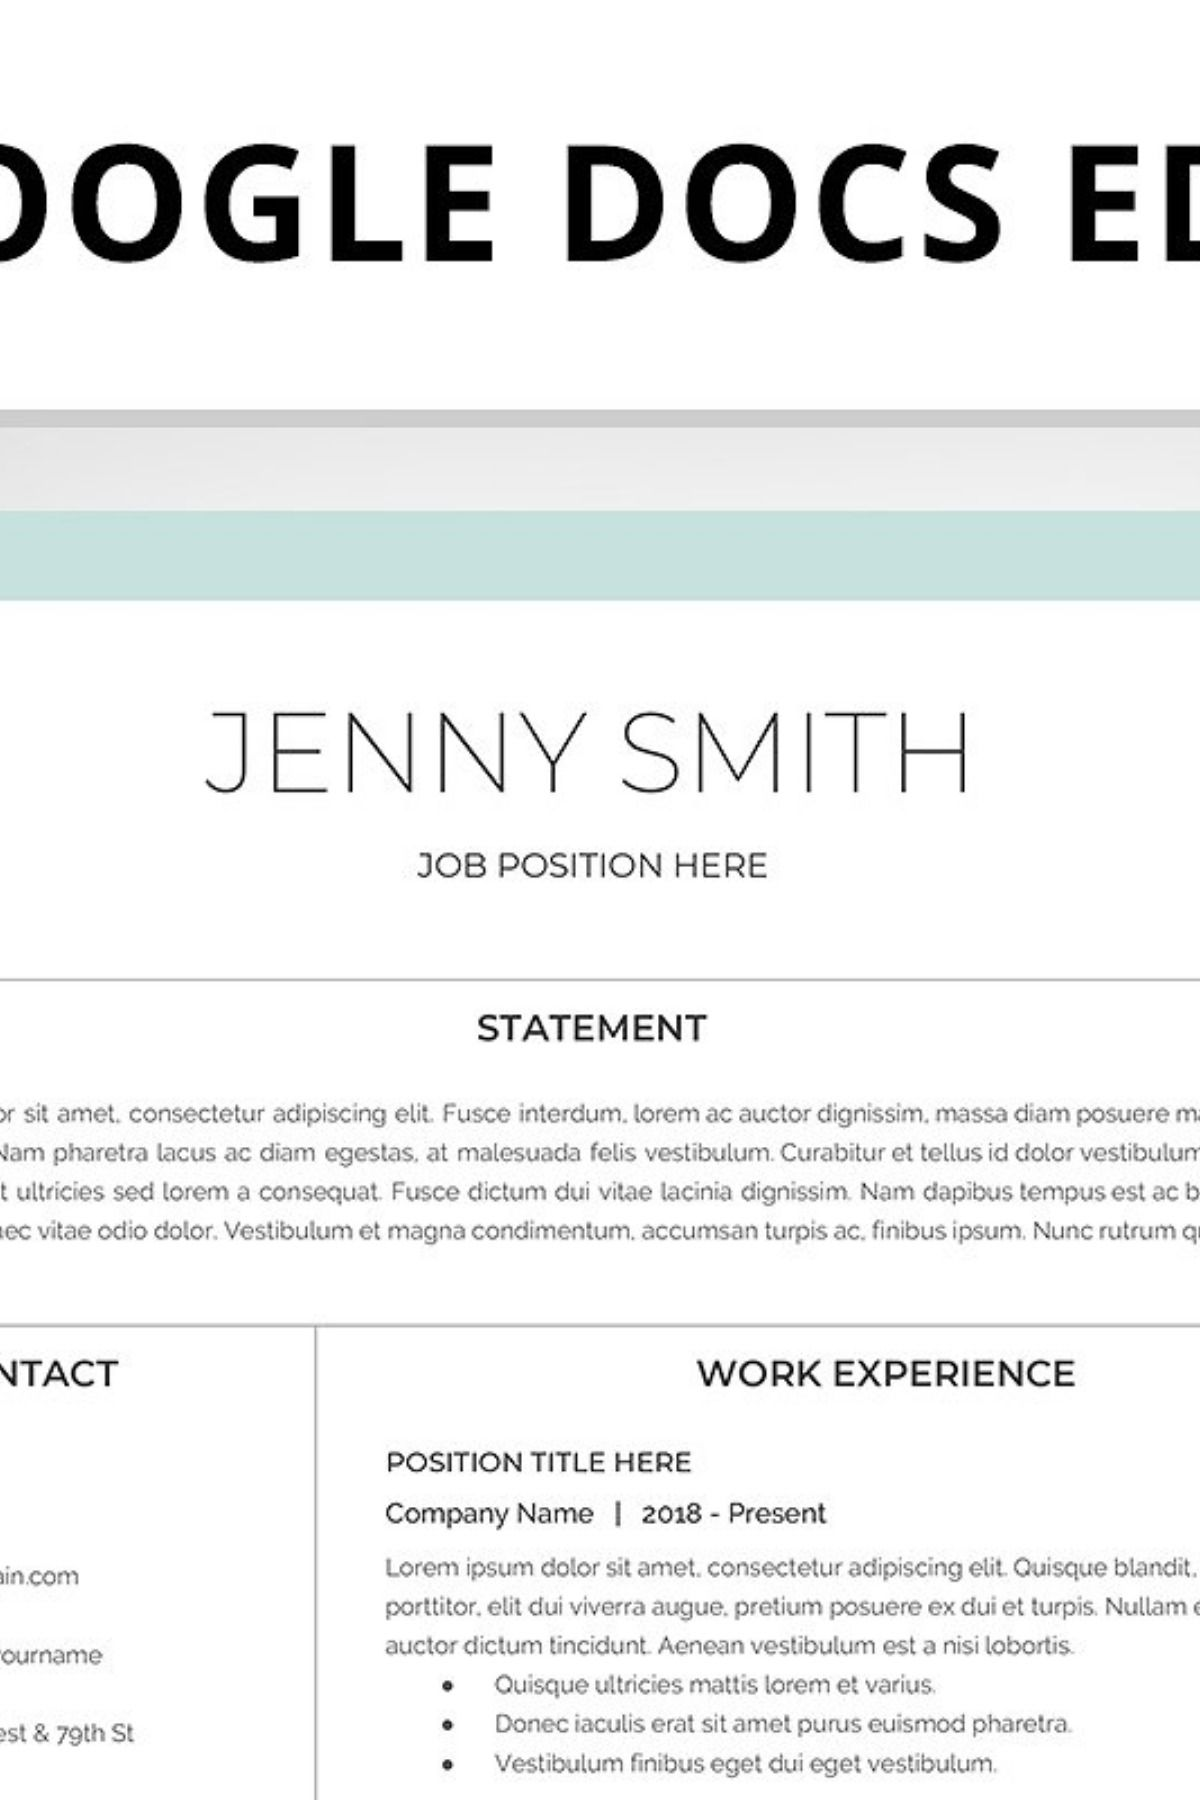 Resume Template, CV, Google Docs Resume template